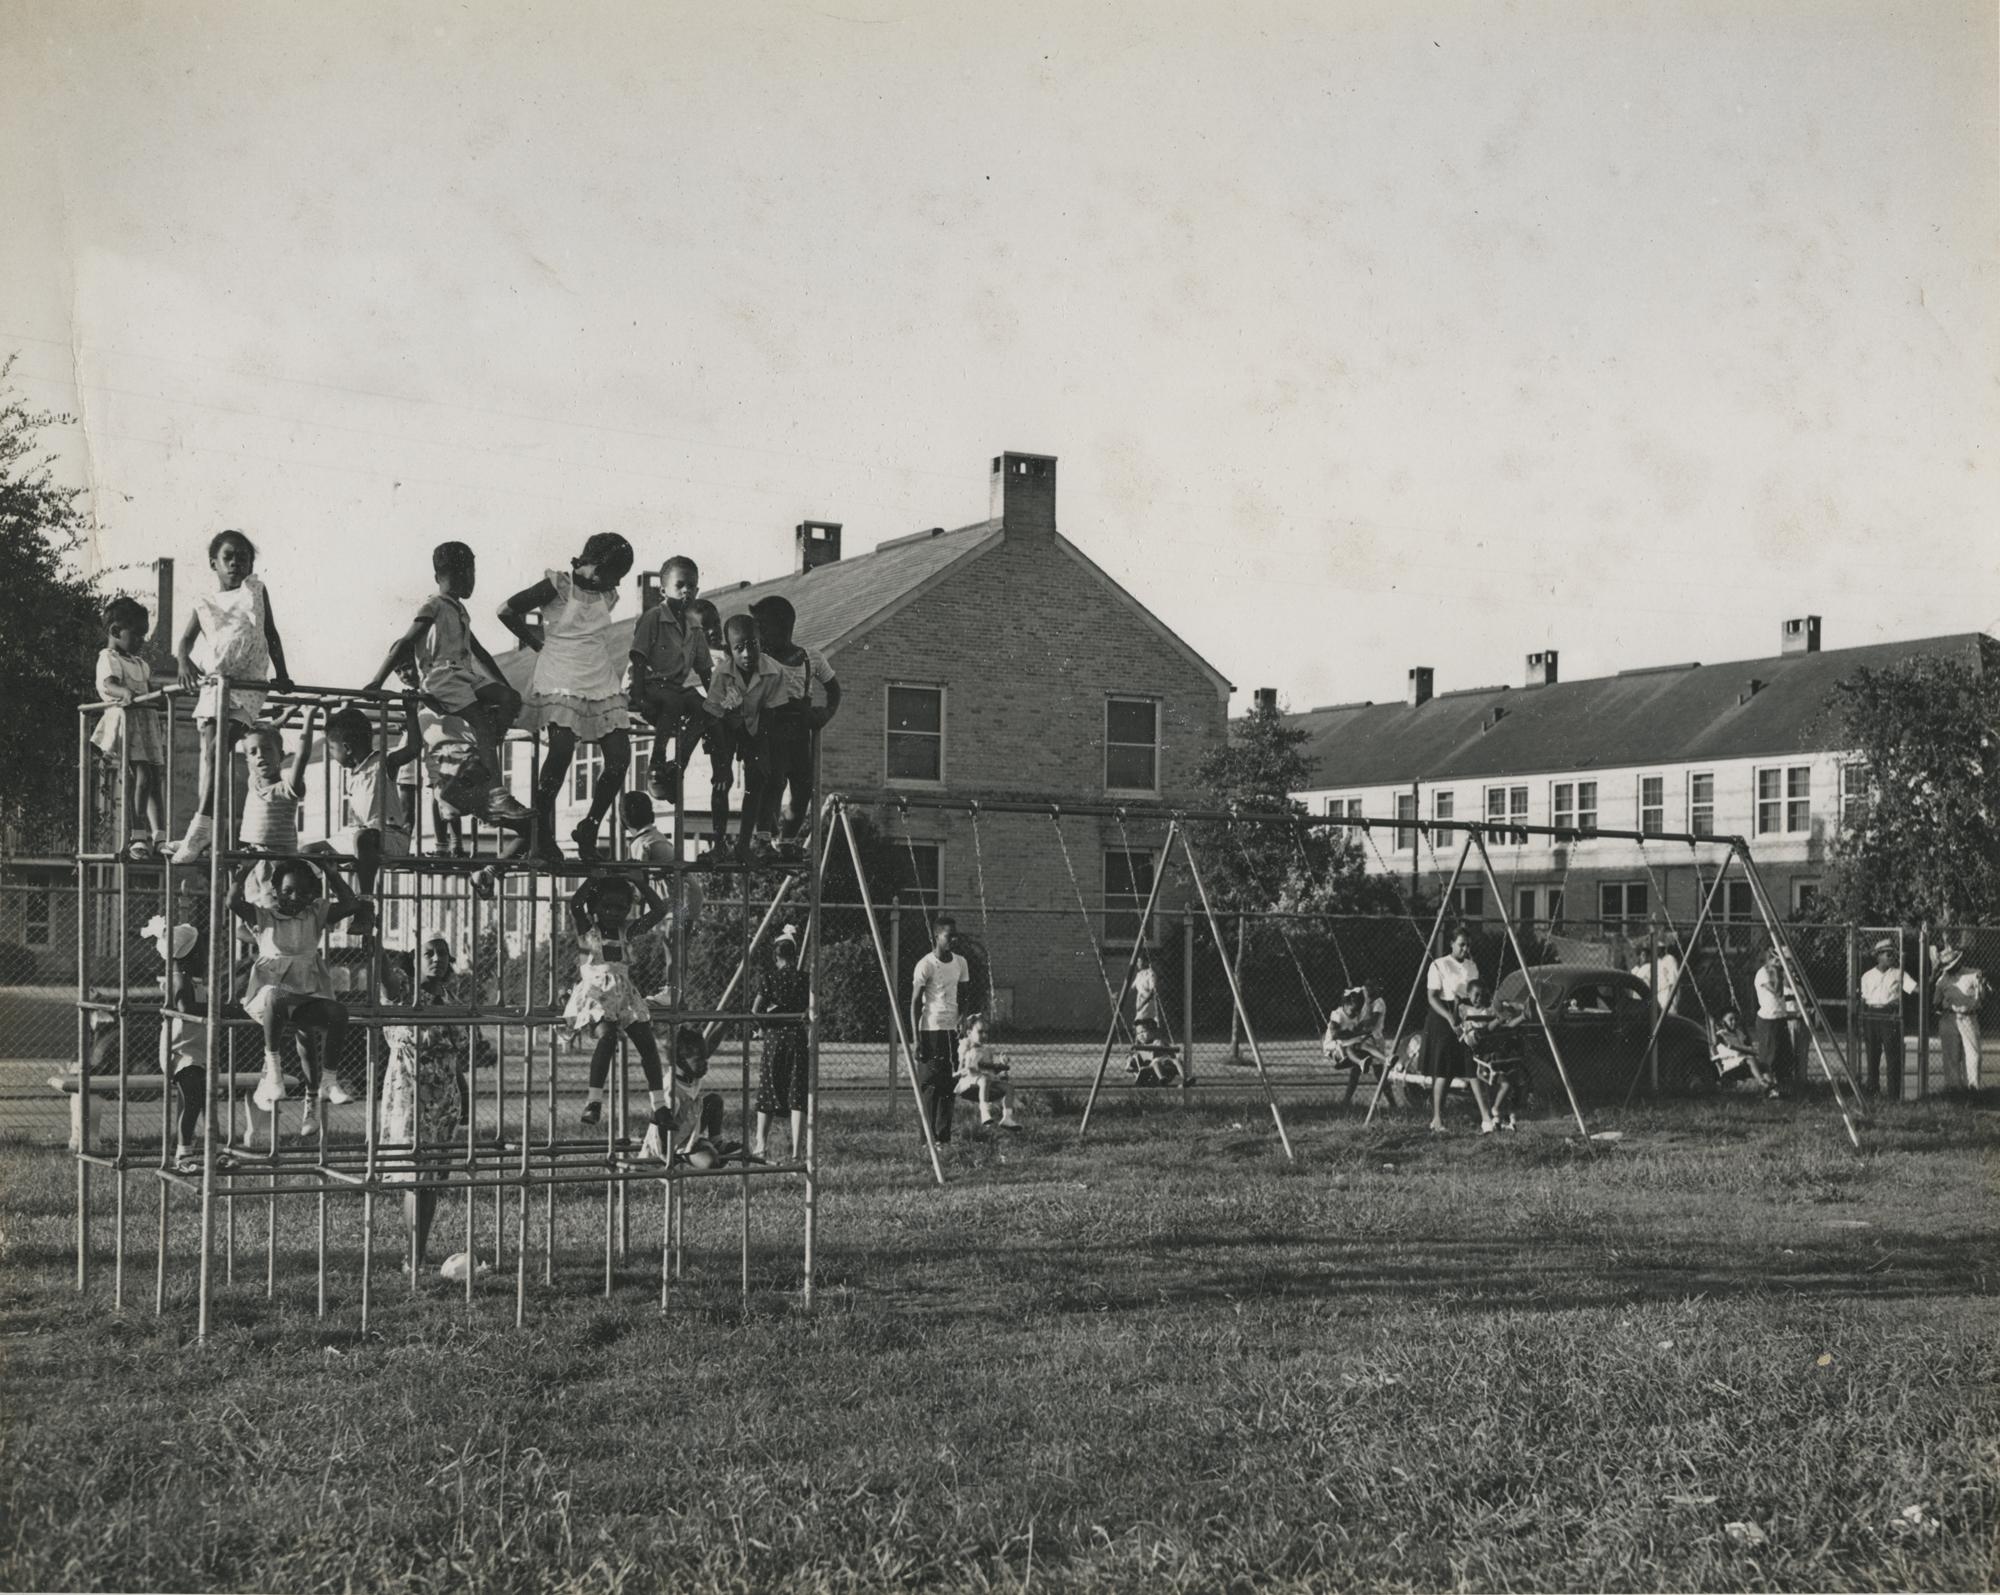 Children on playground equipment at Lincoln Playground. New Orleans (La.) Recreation Dept. Scrapbook photographs, 1947-1948